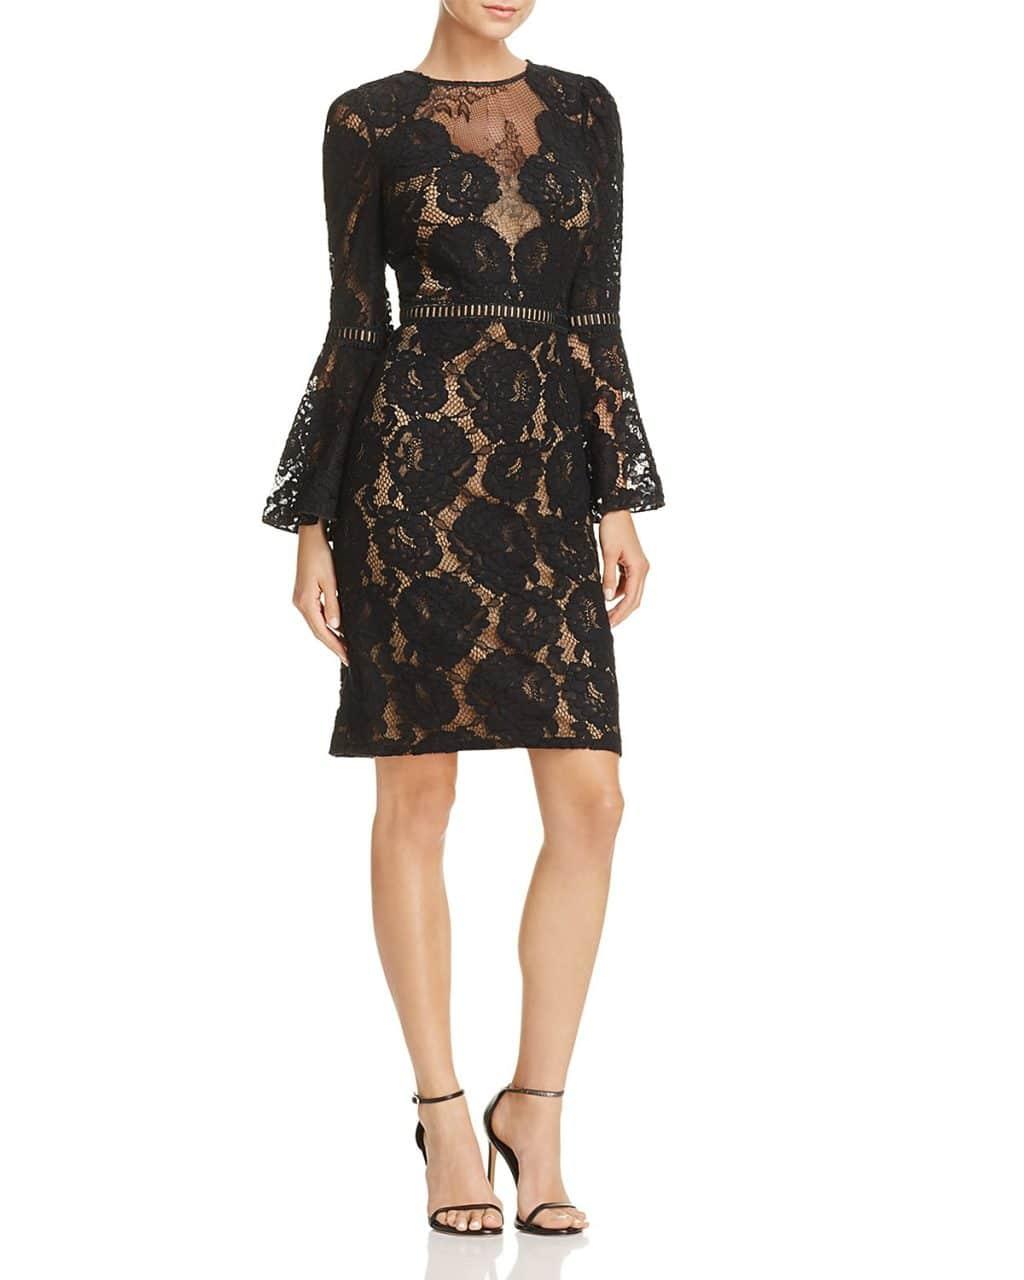 TADASHI SHOJI Lace Bell Sleeve Black / Nude Dress